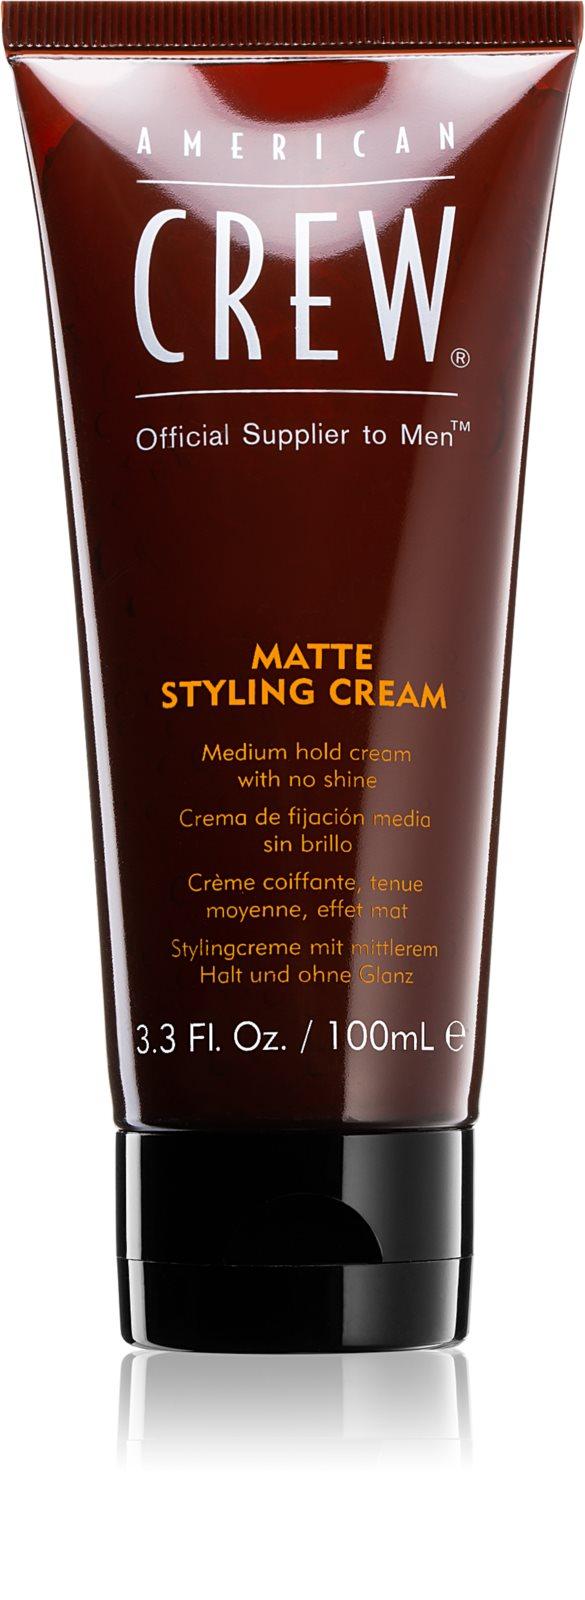 American Crew Styling Matte Styling Cream - stredne tužiaci gél s matným vzhľadom, 100 ml